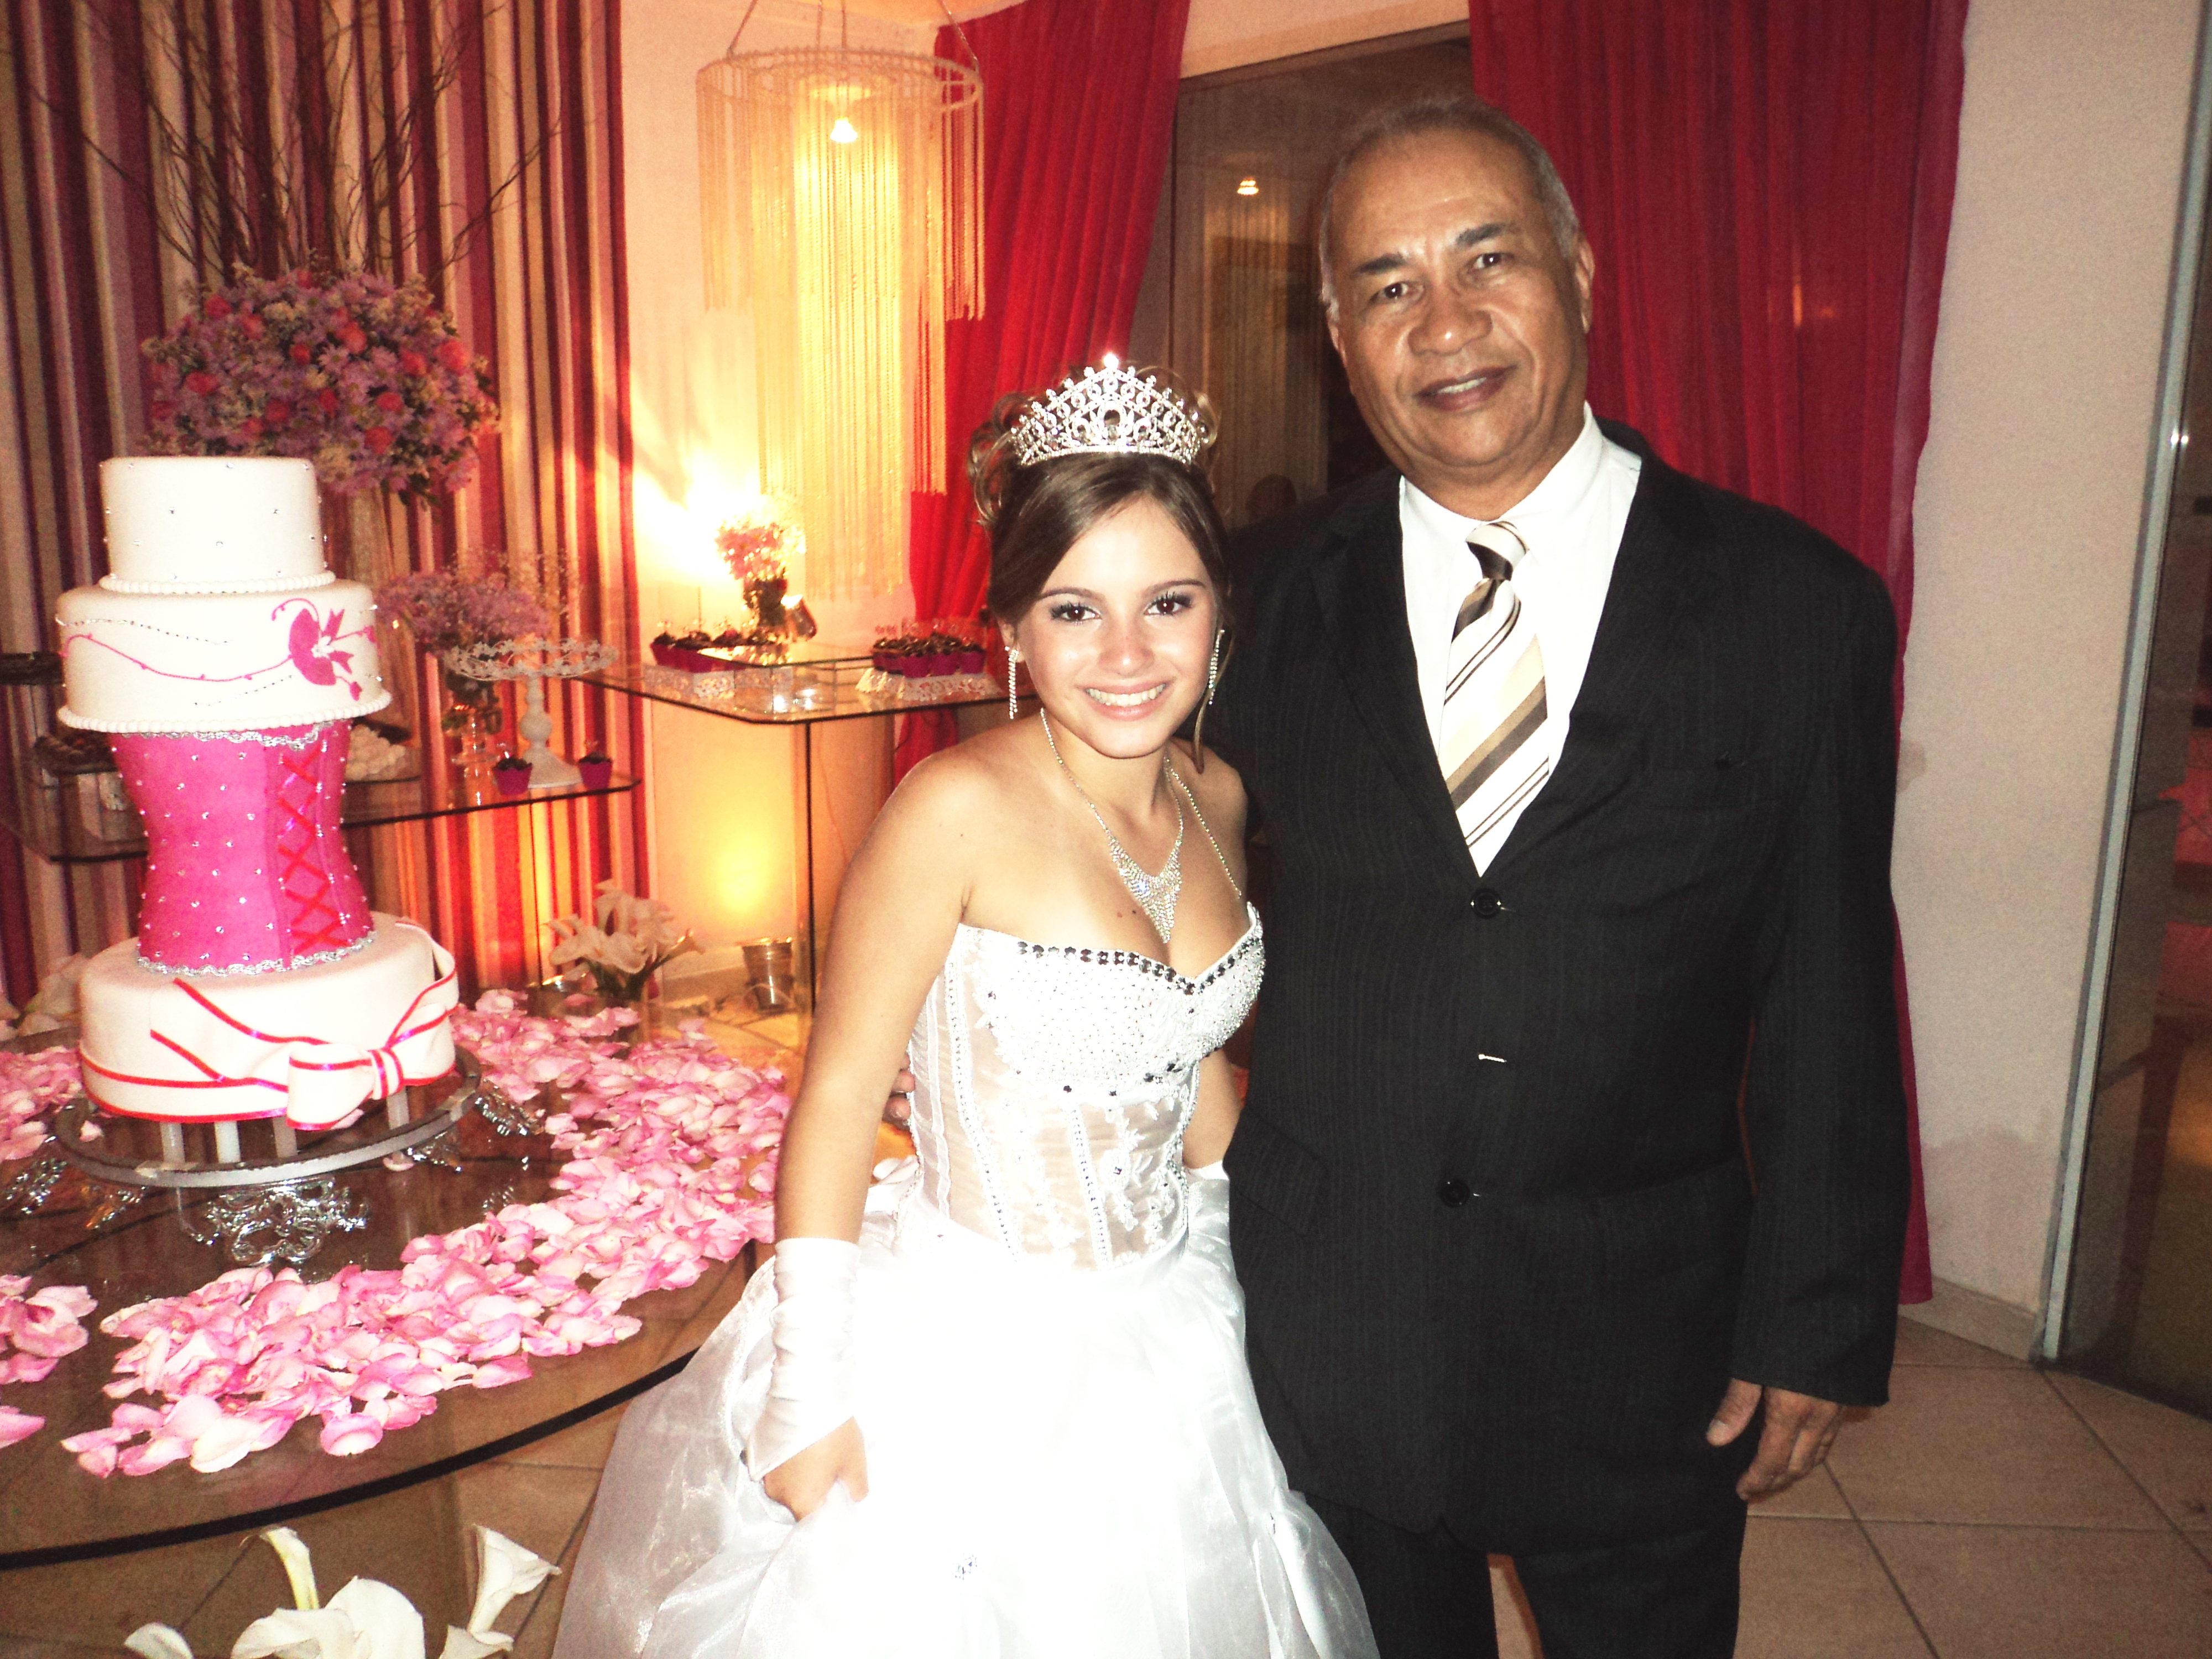 foto debutante Yanes com Túlio de Pinho, 2.5.14